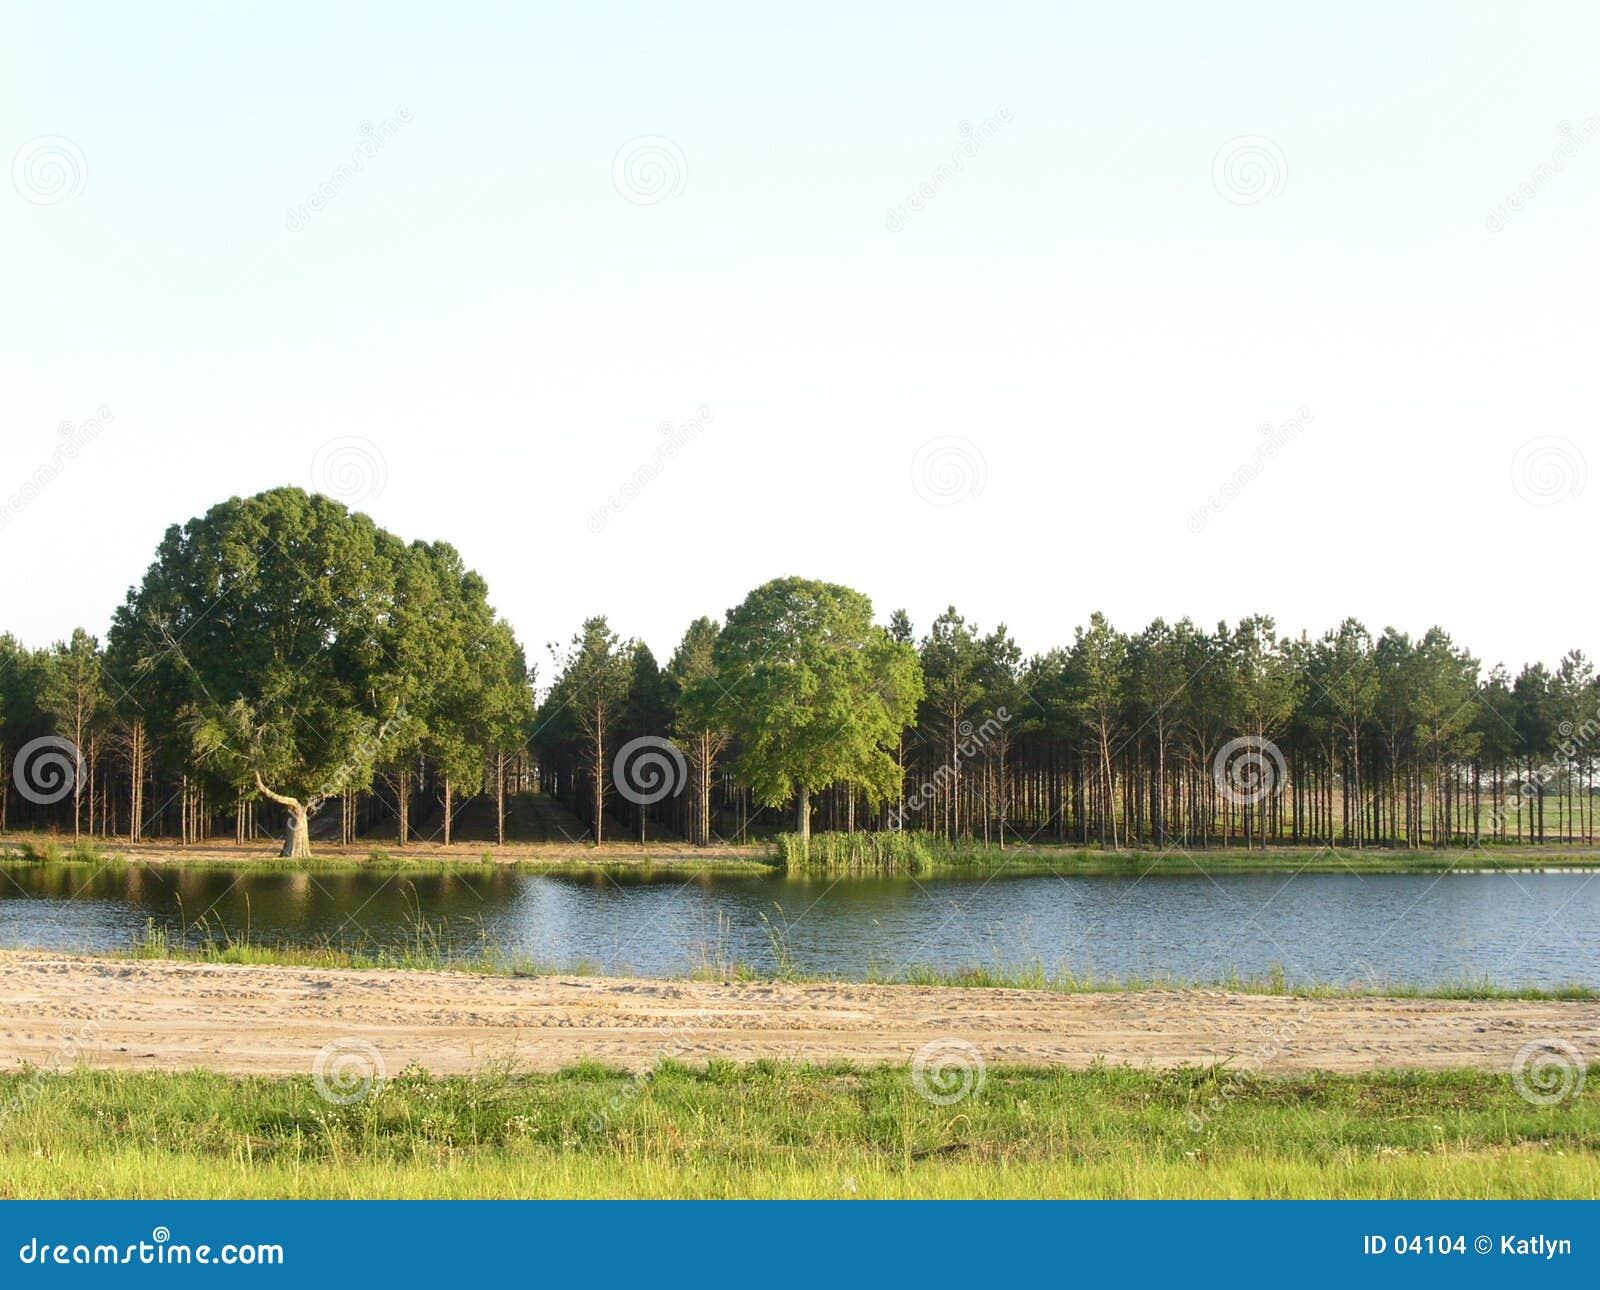 Pines & pond